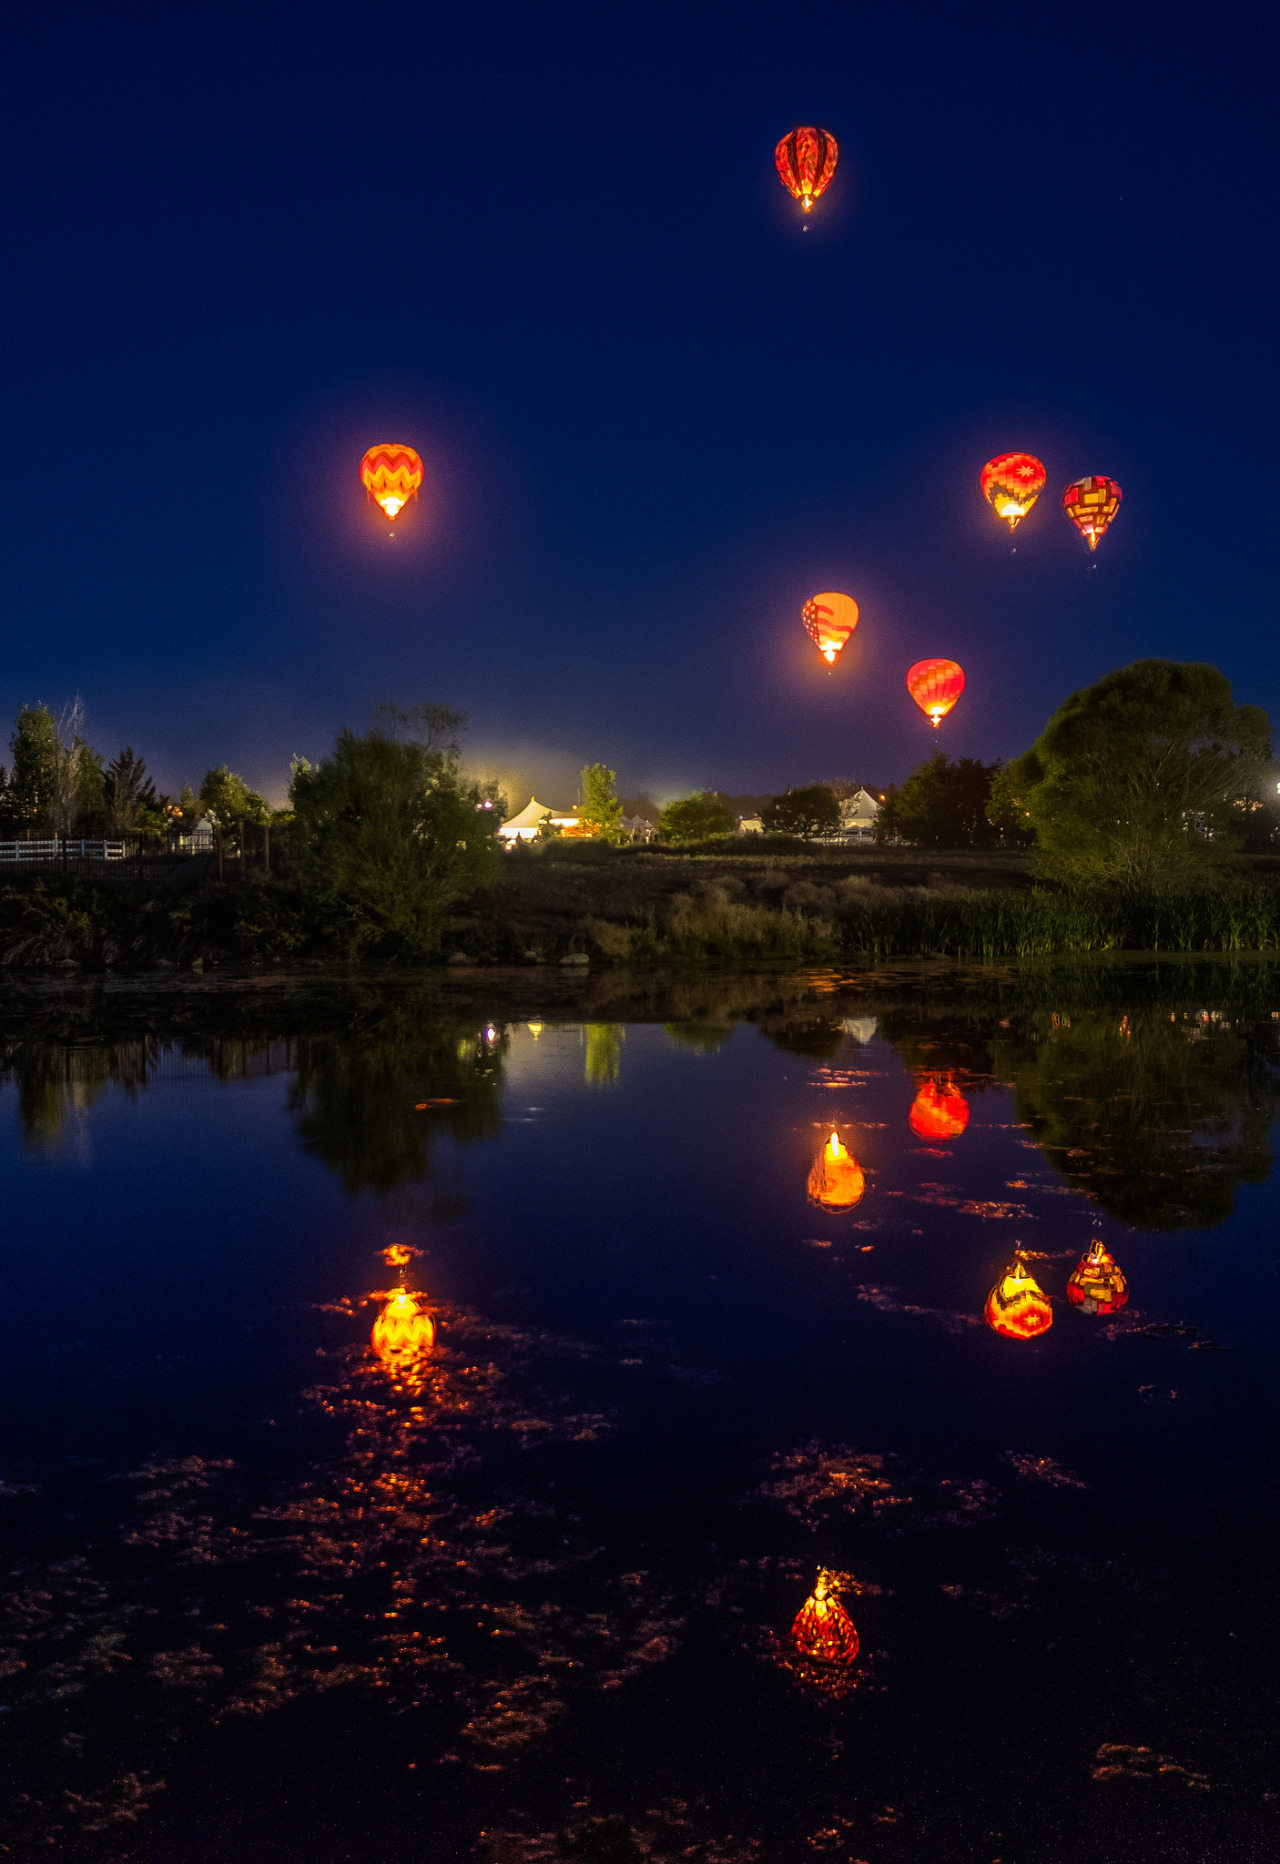 там заметил шарики в небо ночью фото приготовил этот